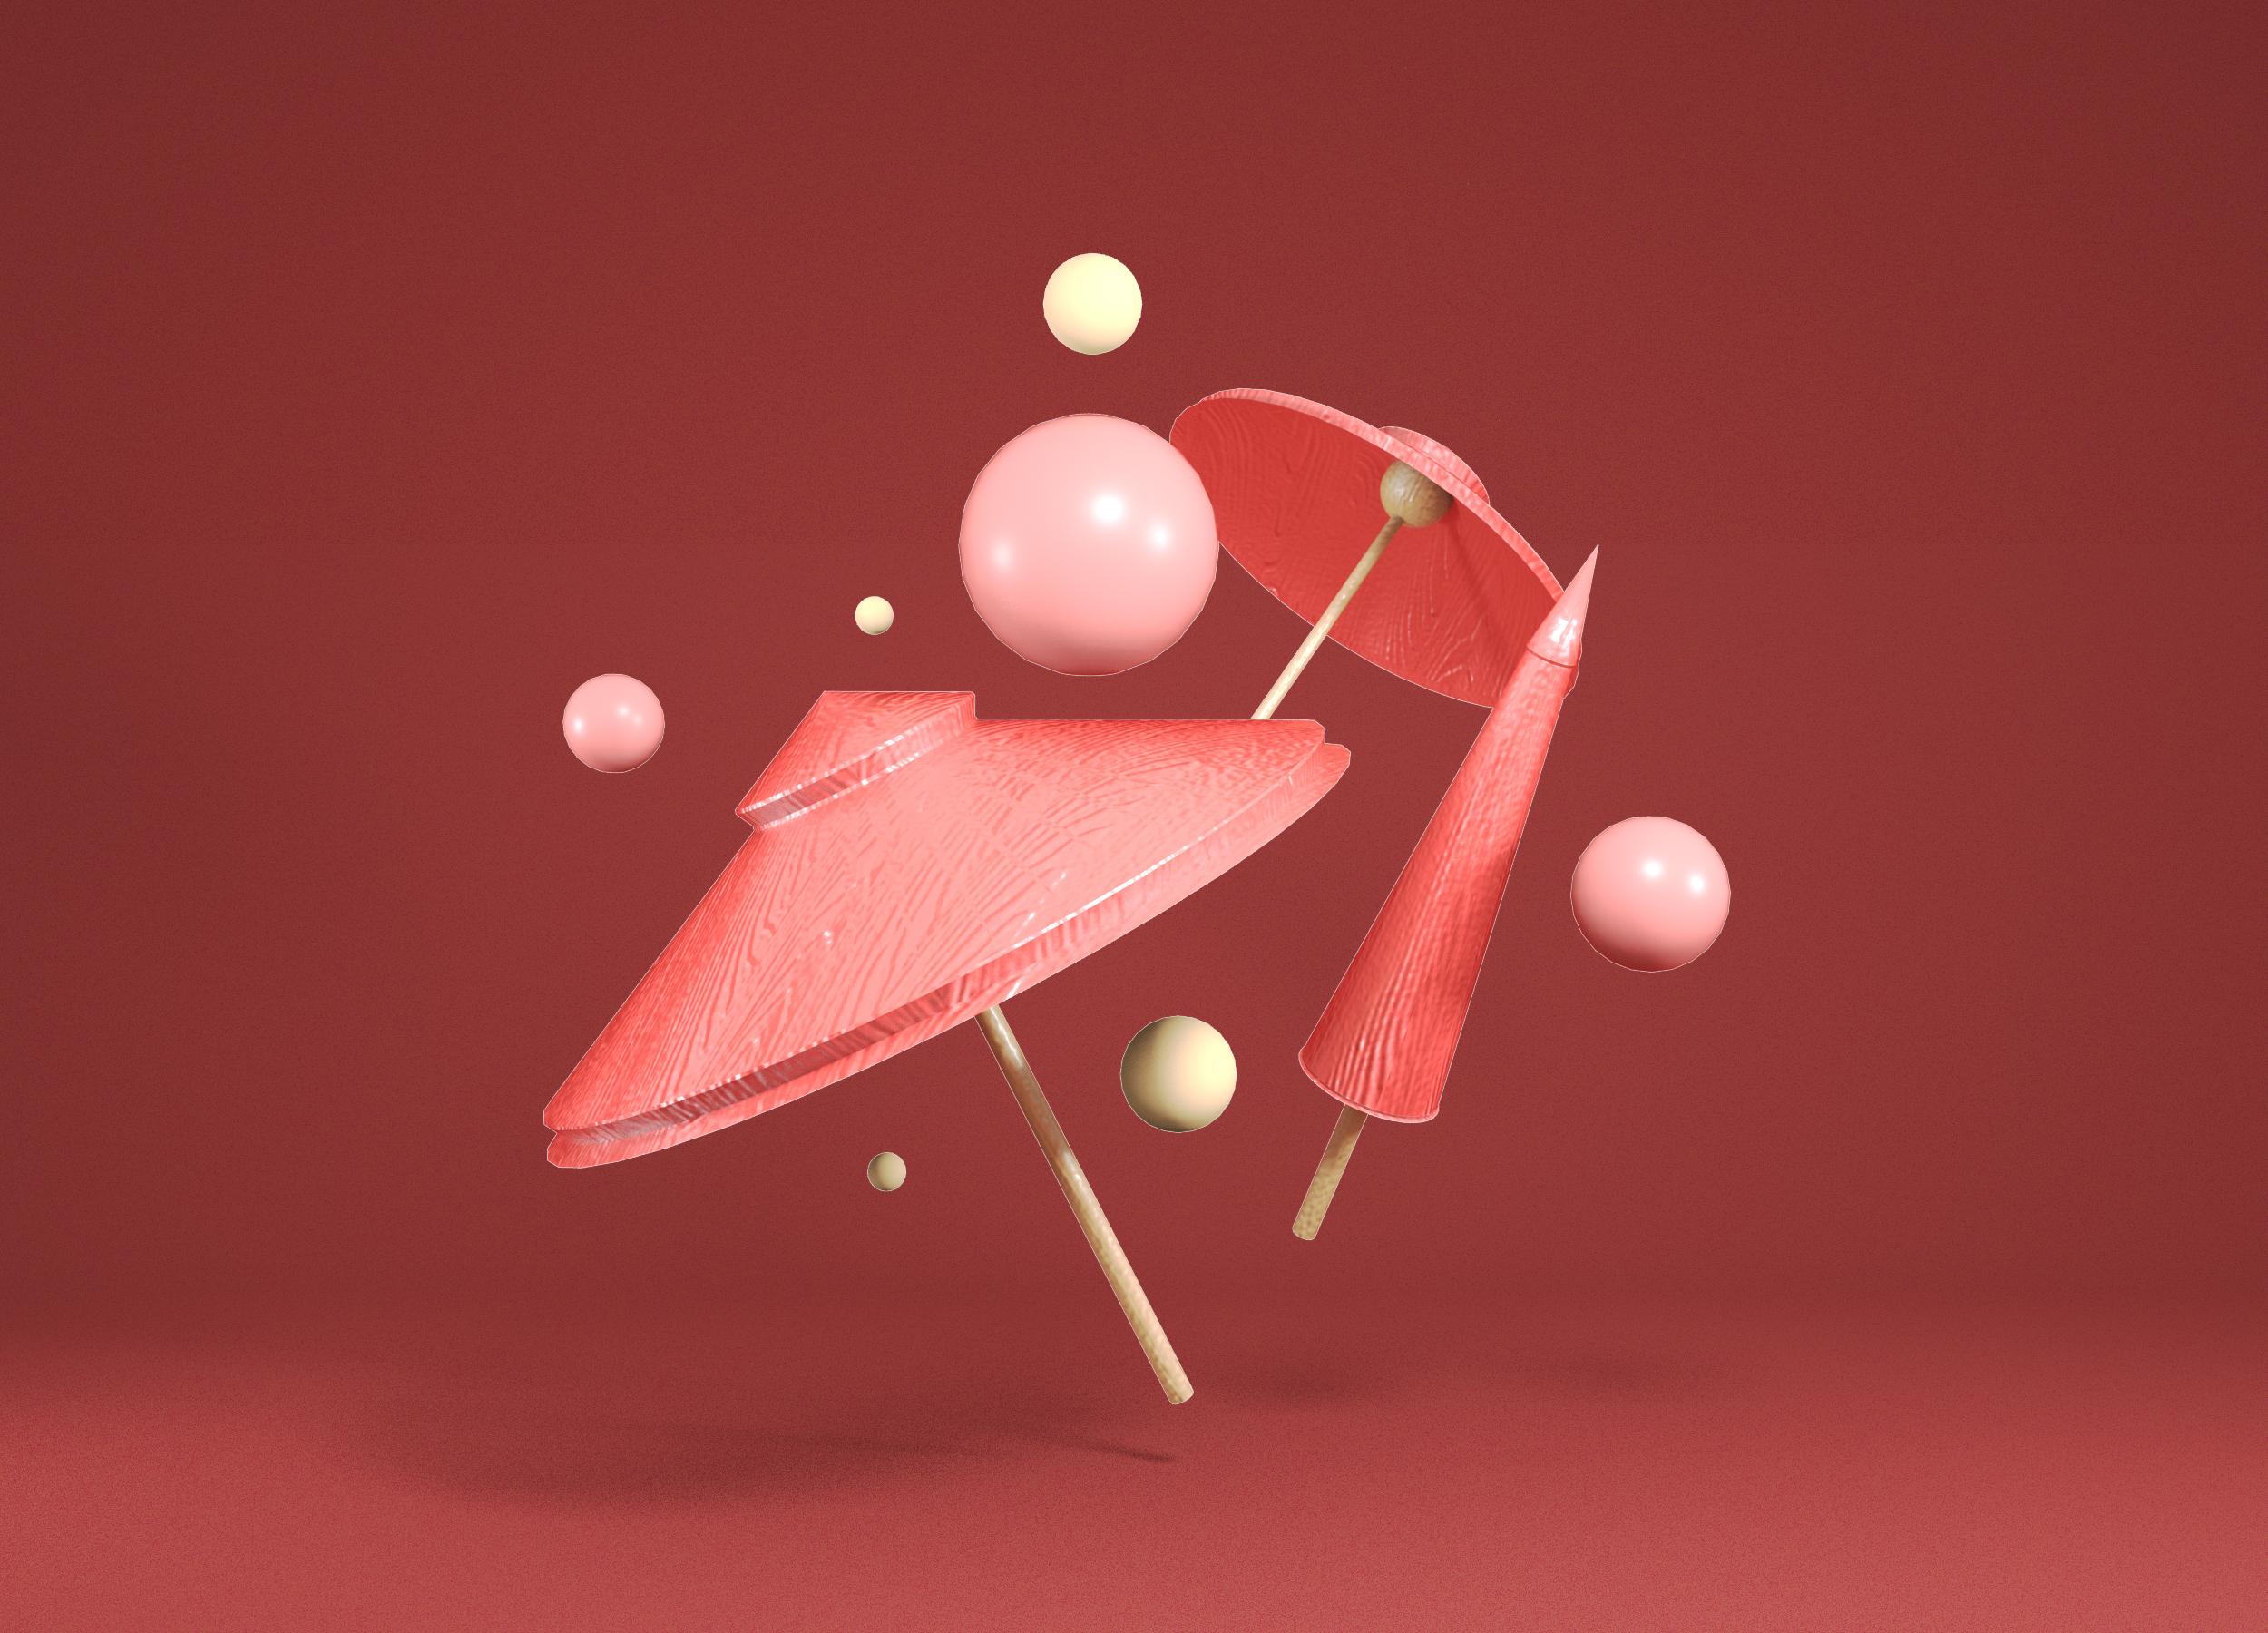 C4D装饰元素中国风油纸伞3d立体几何C4D装饰元素中国风油纸伞3d立体几何.jpg